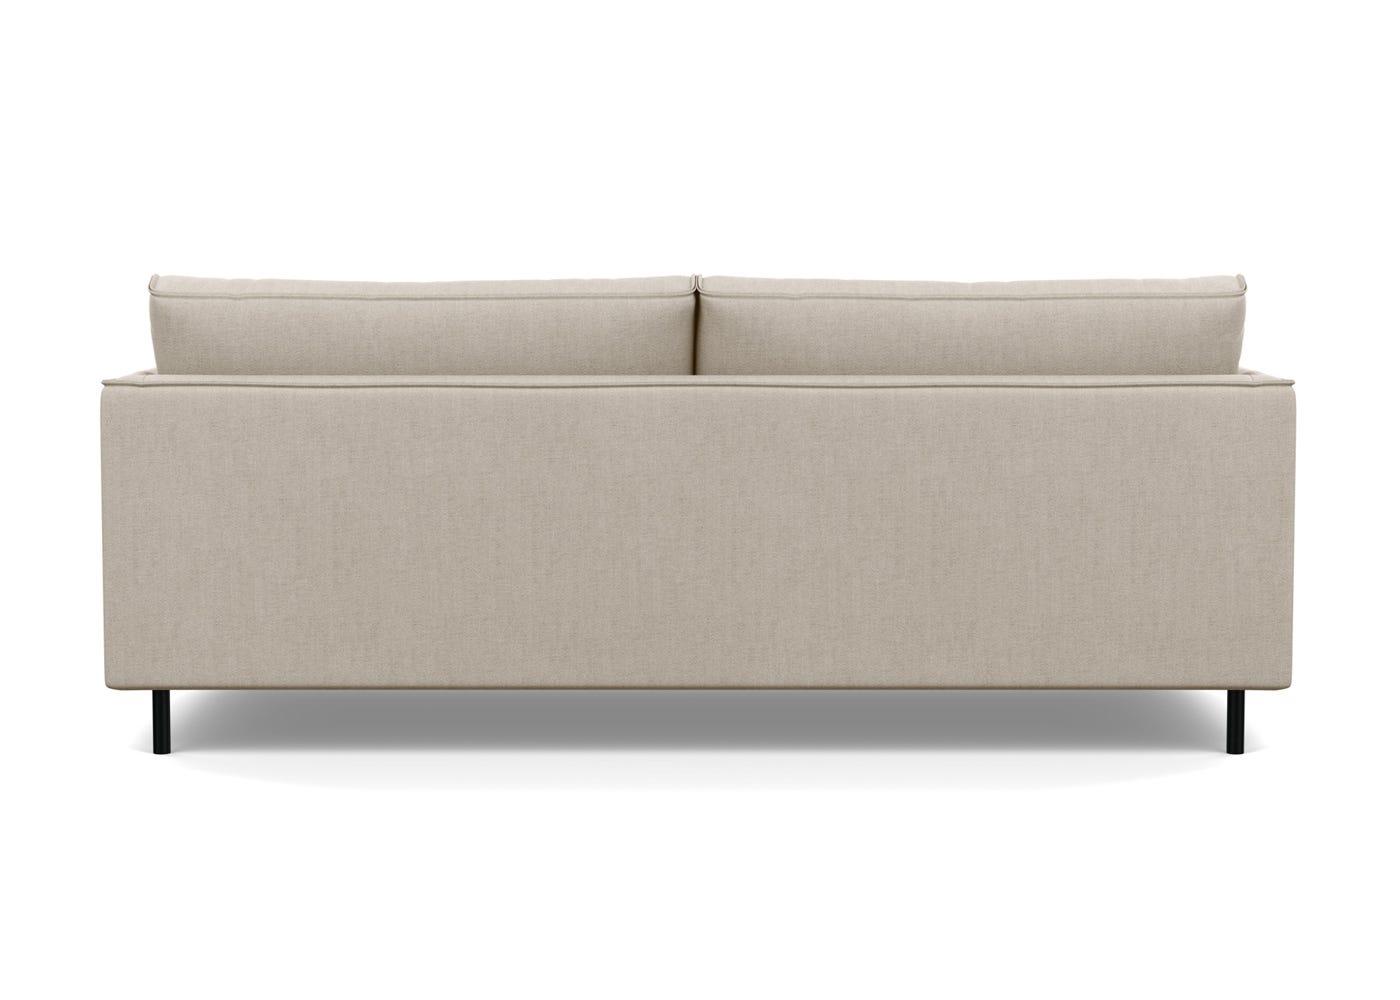 Tortona 3 Seater Sofa in Broad Weave Putty - Rear